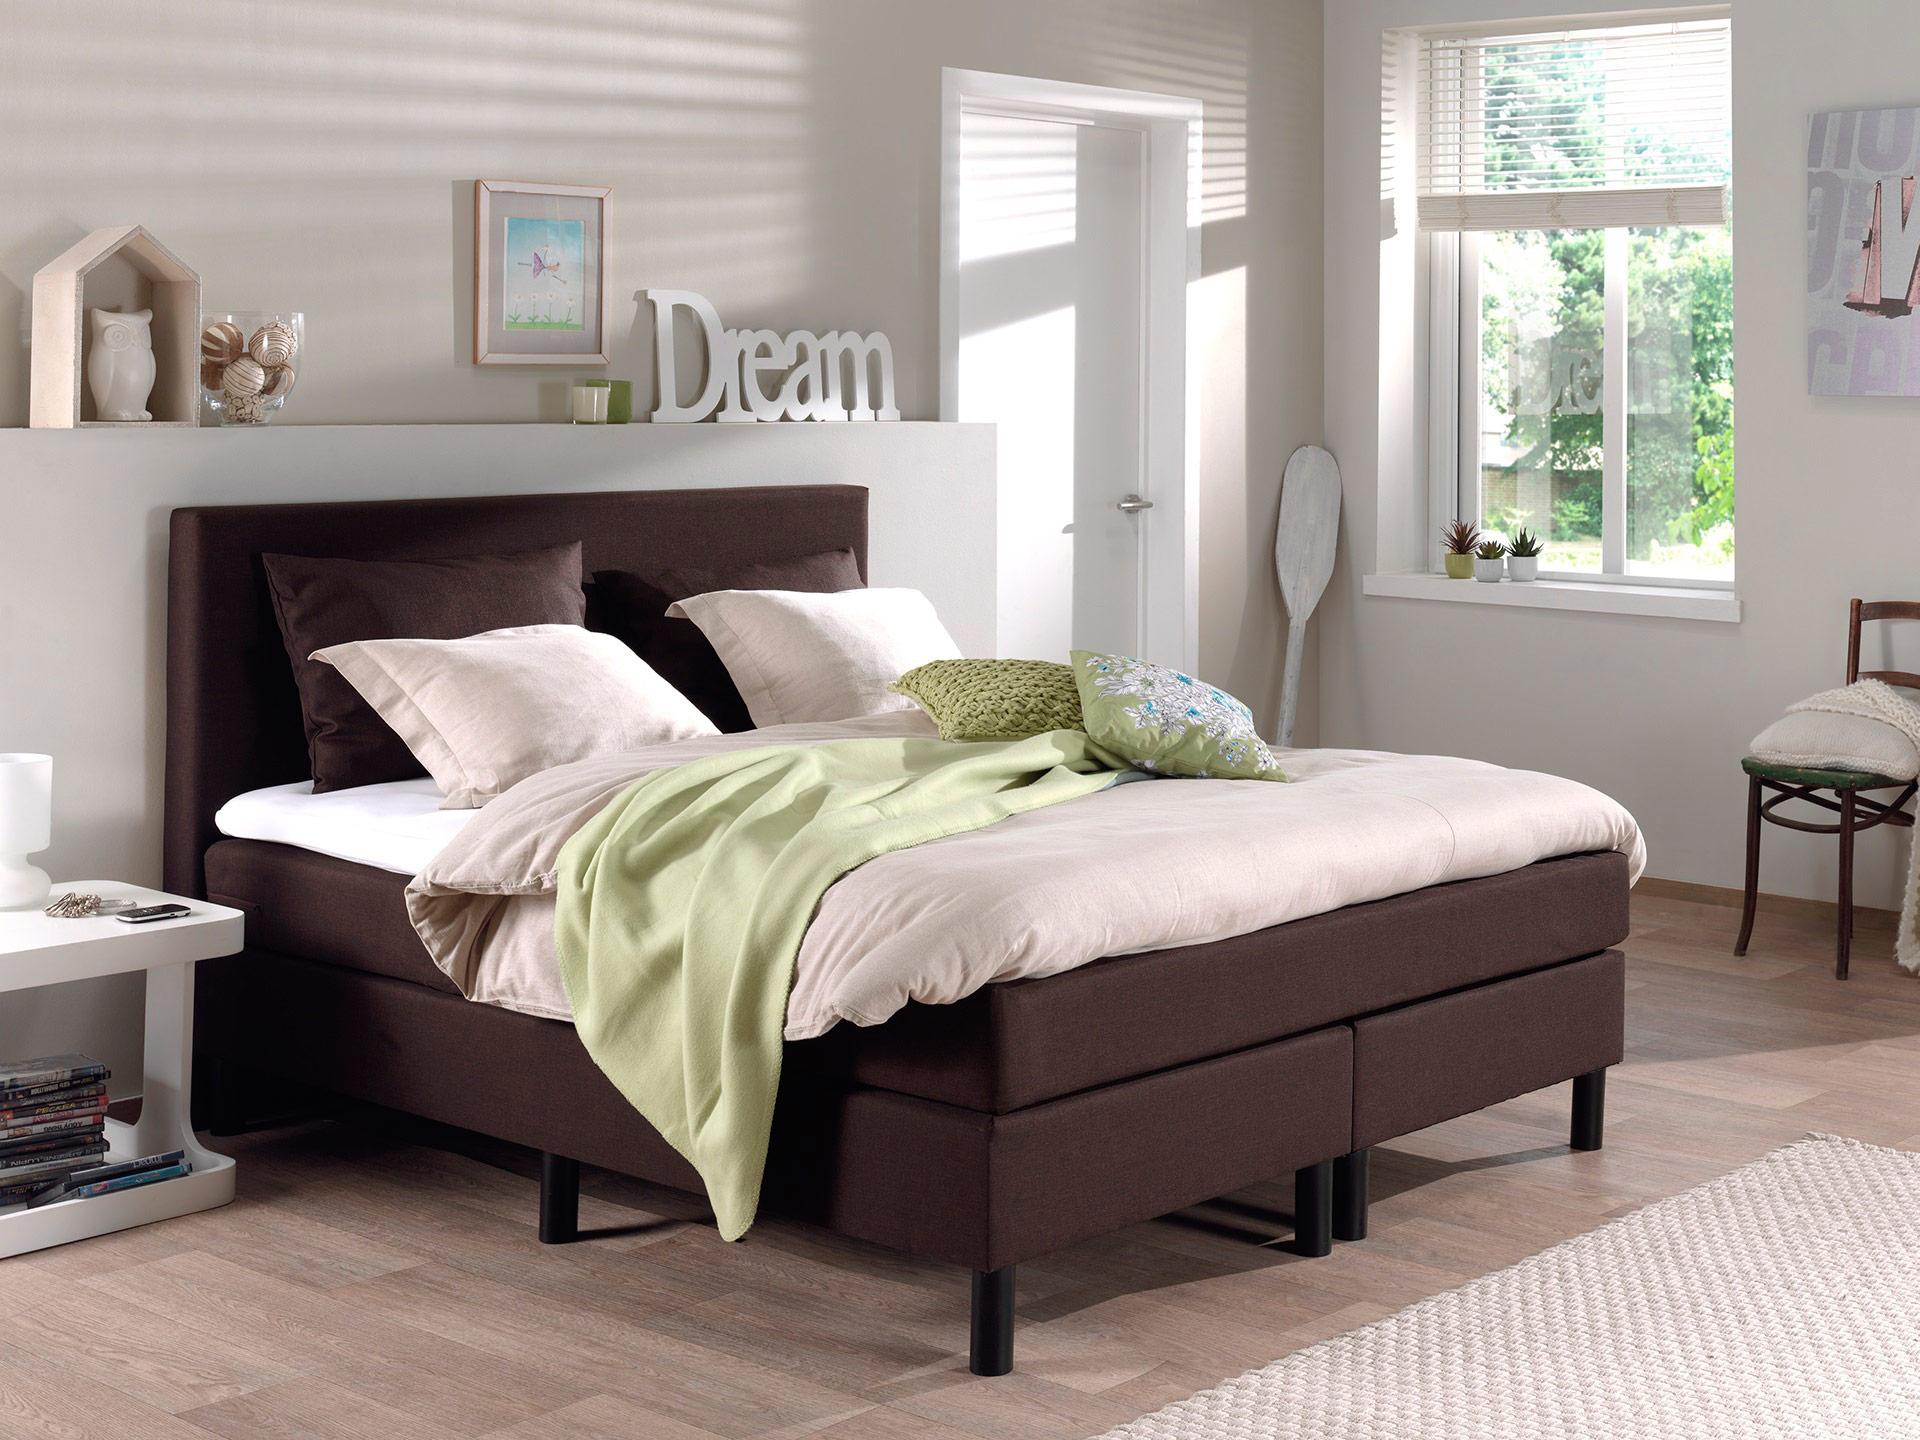 le boxspring le must de la literie blog matelpro. Black Bedroom Furniture Sets. Home Design Ideas